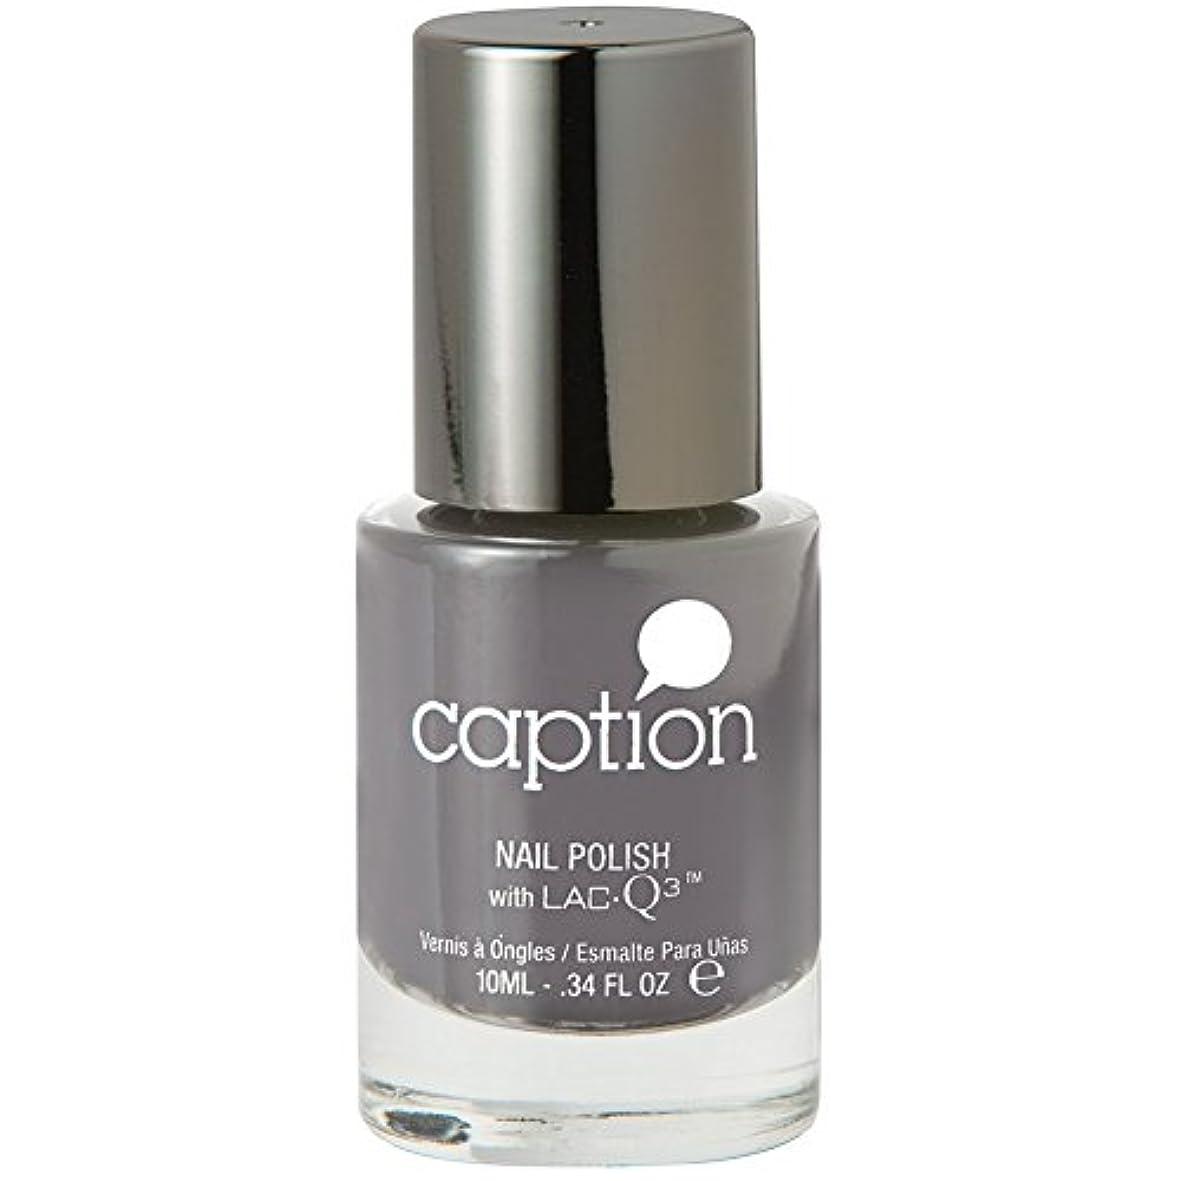 Caption Nail Polish in Isnt Thaaat Nice? .34 oz by Caption Nail Polish